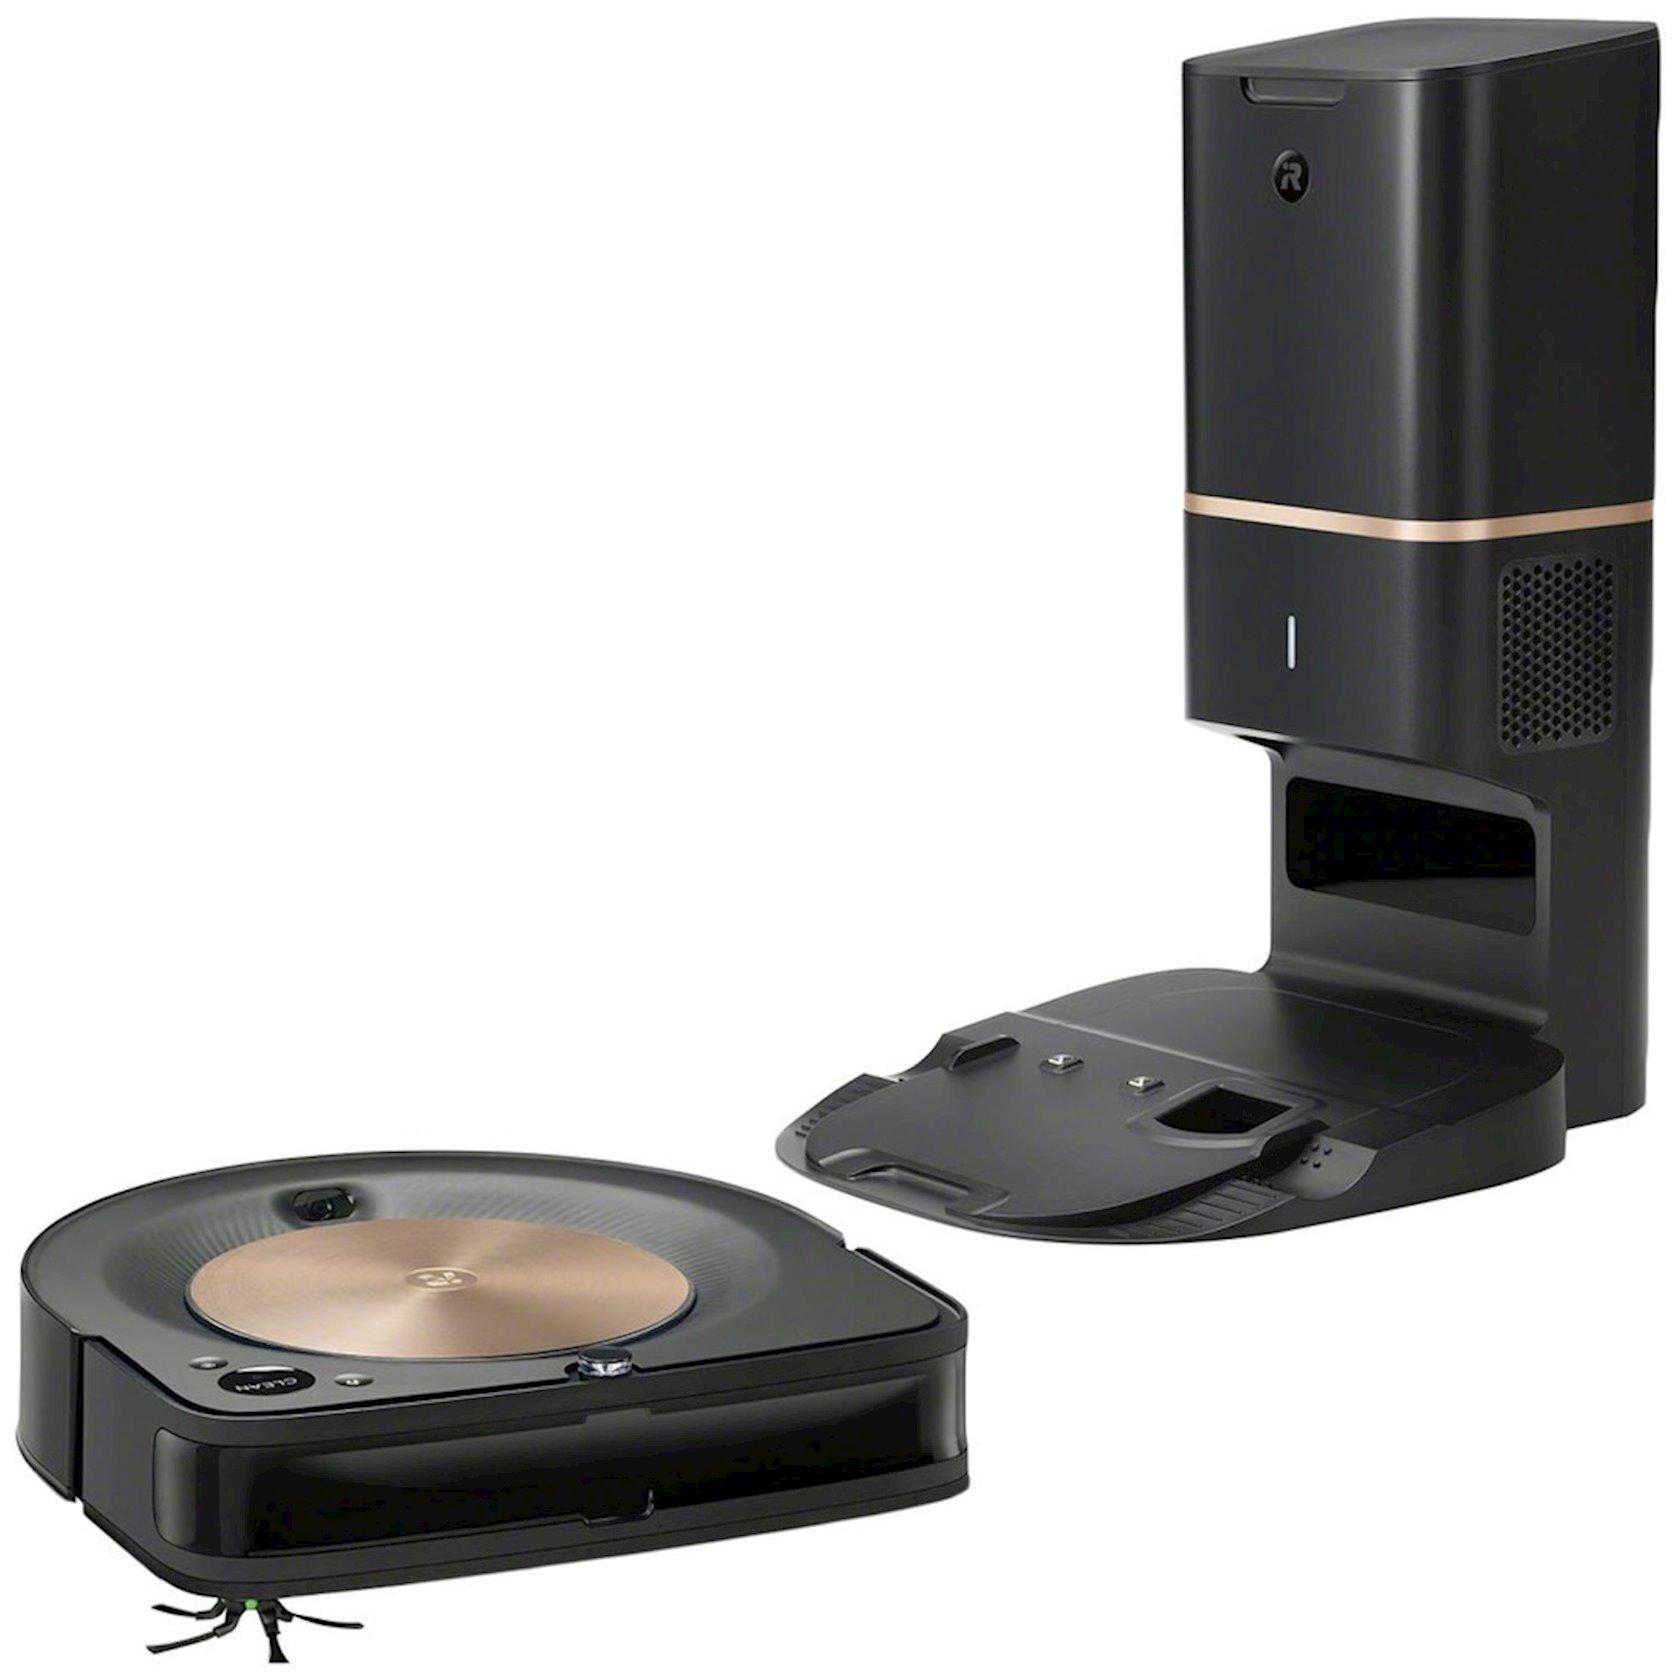 Robot tozsoran iRobot Roomba S9+